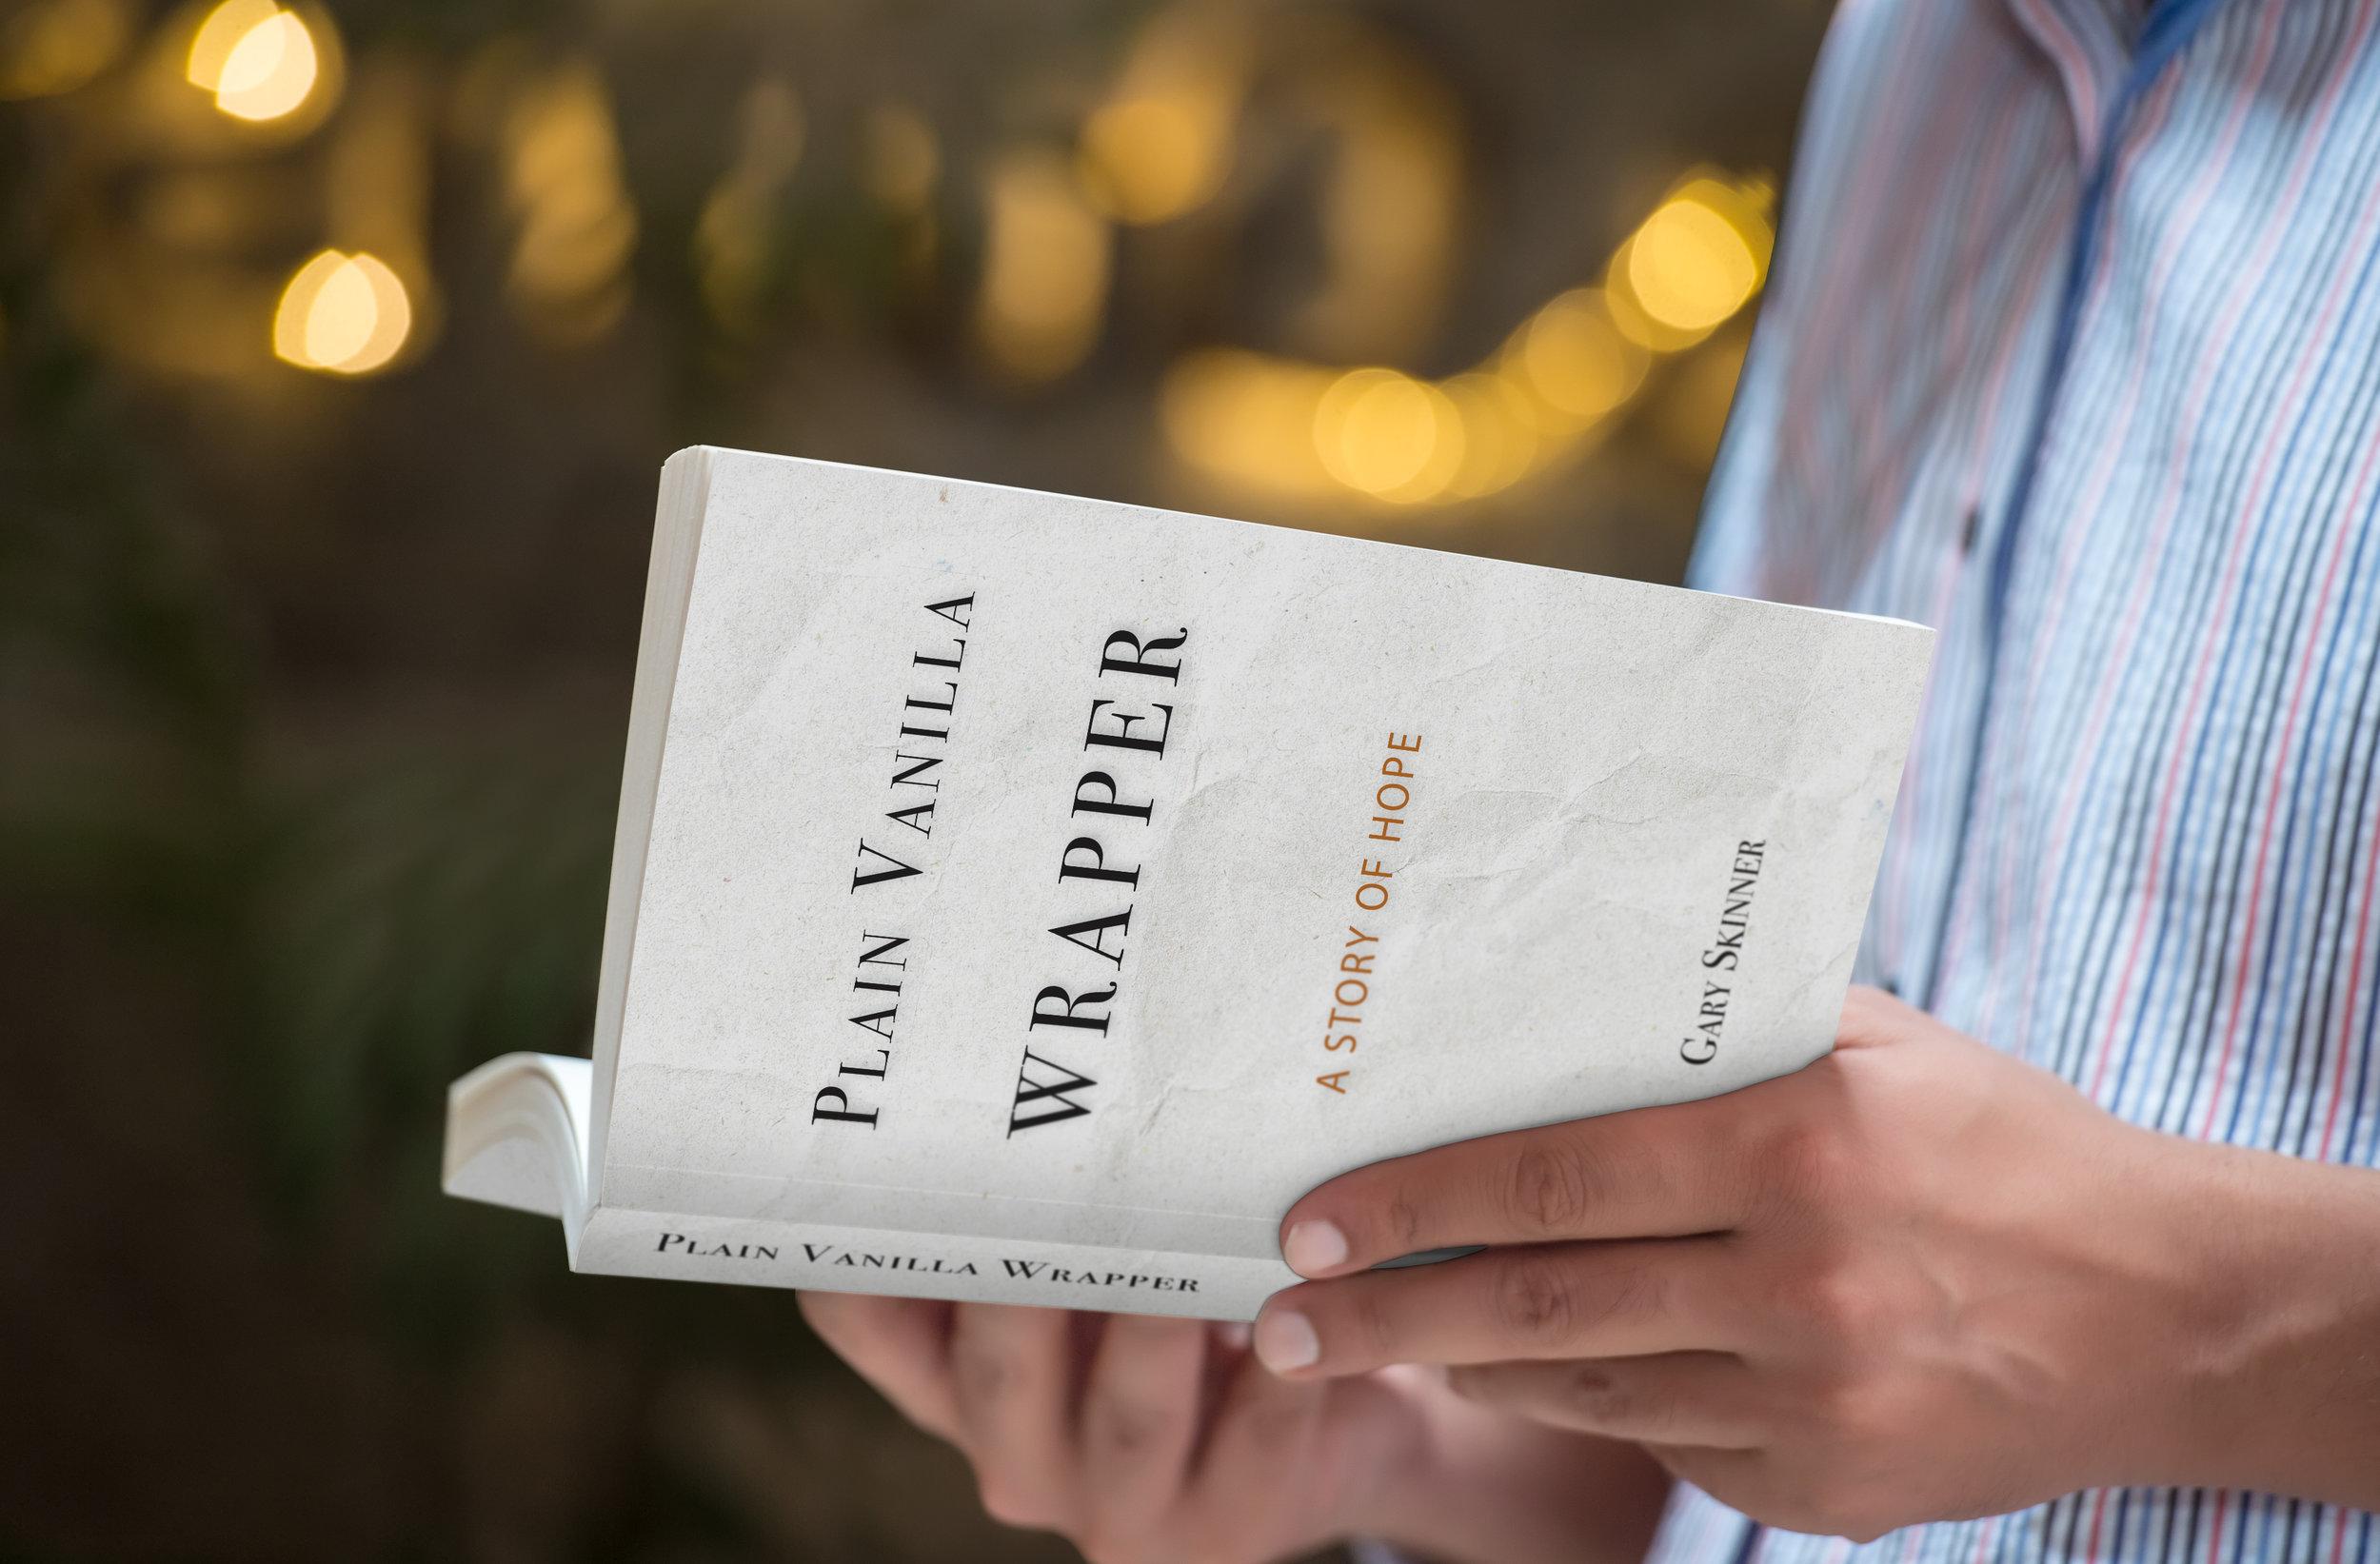 PVW Reading Book Mockup.jpg